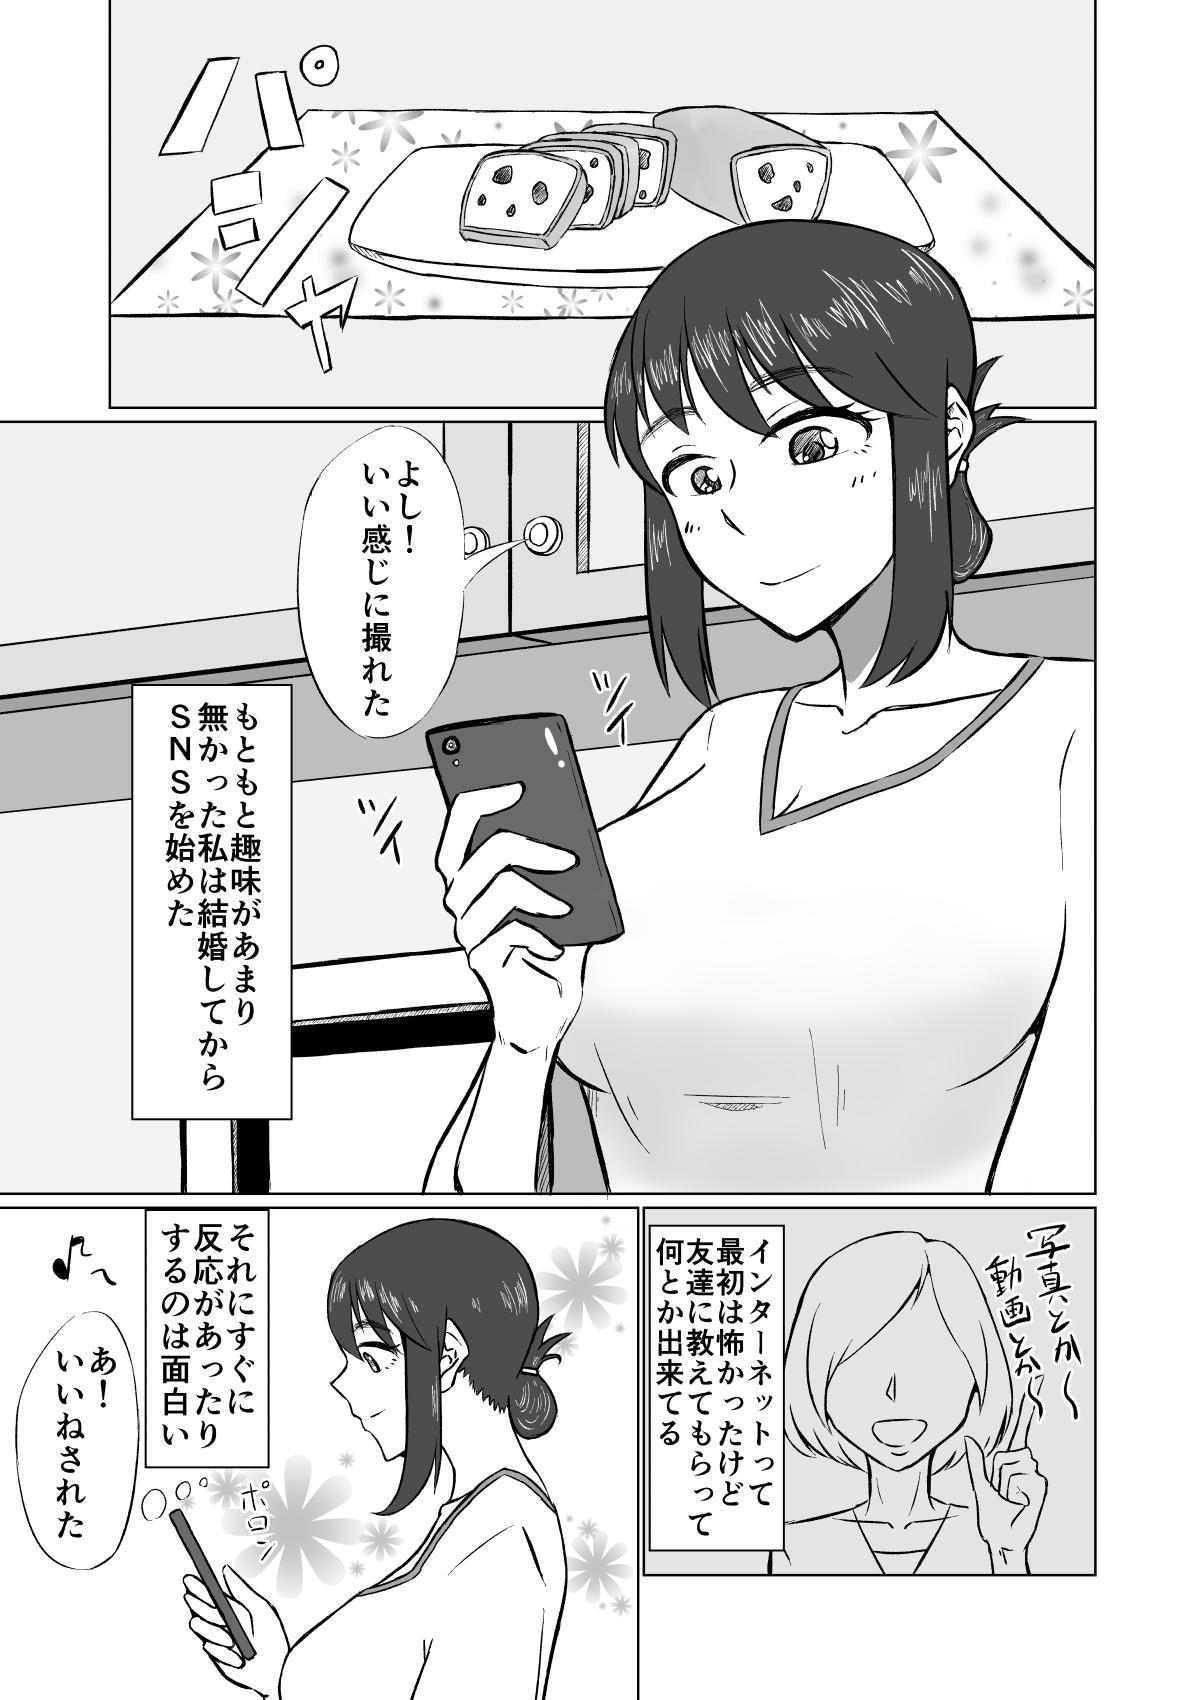 Hitozuma ga Off-kai de Omochikaerare Hon 2